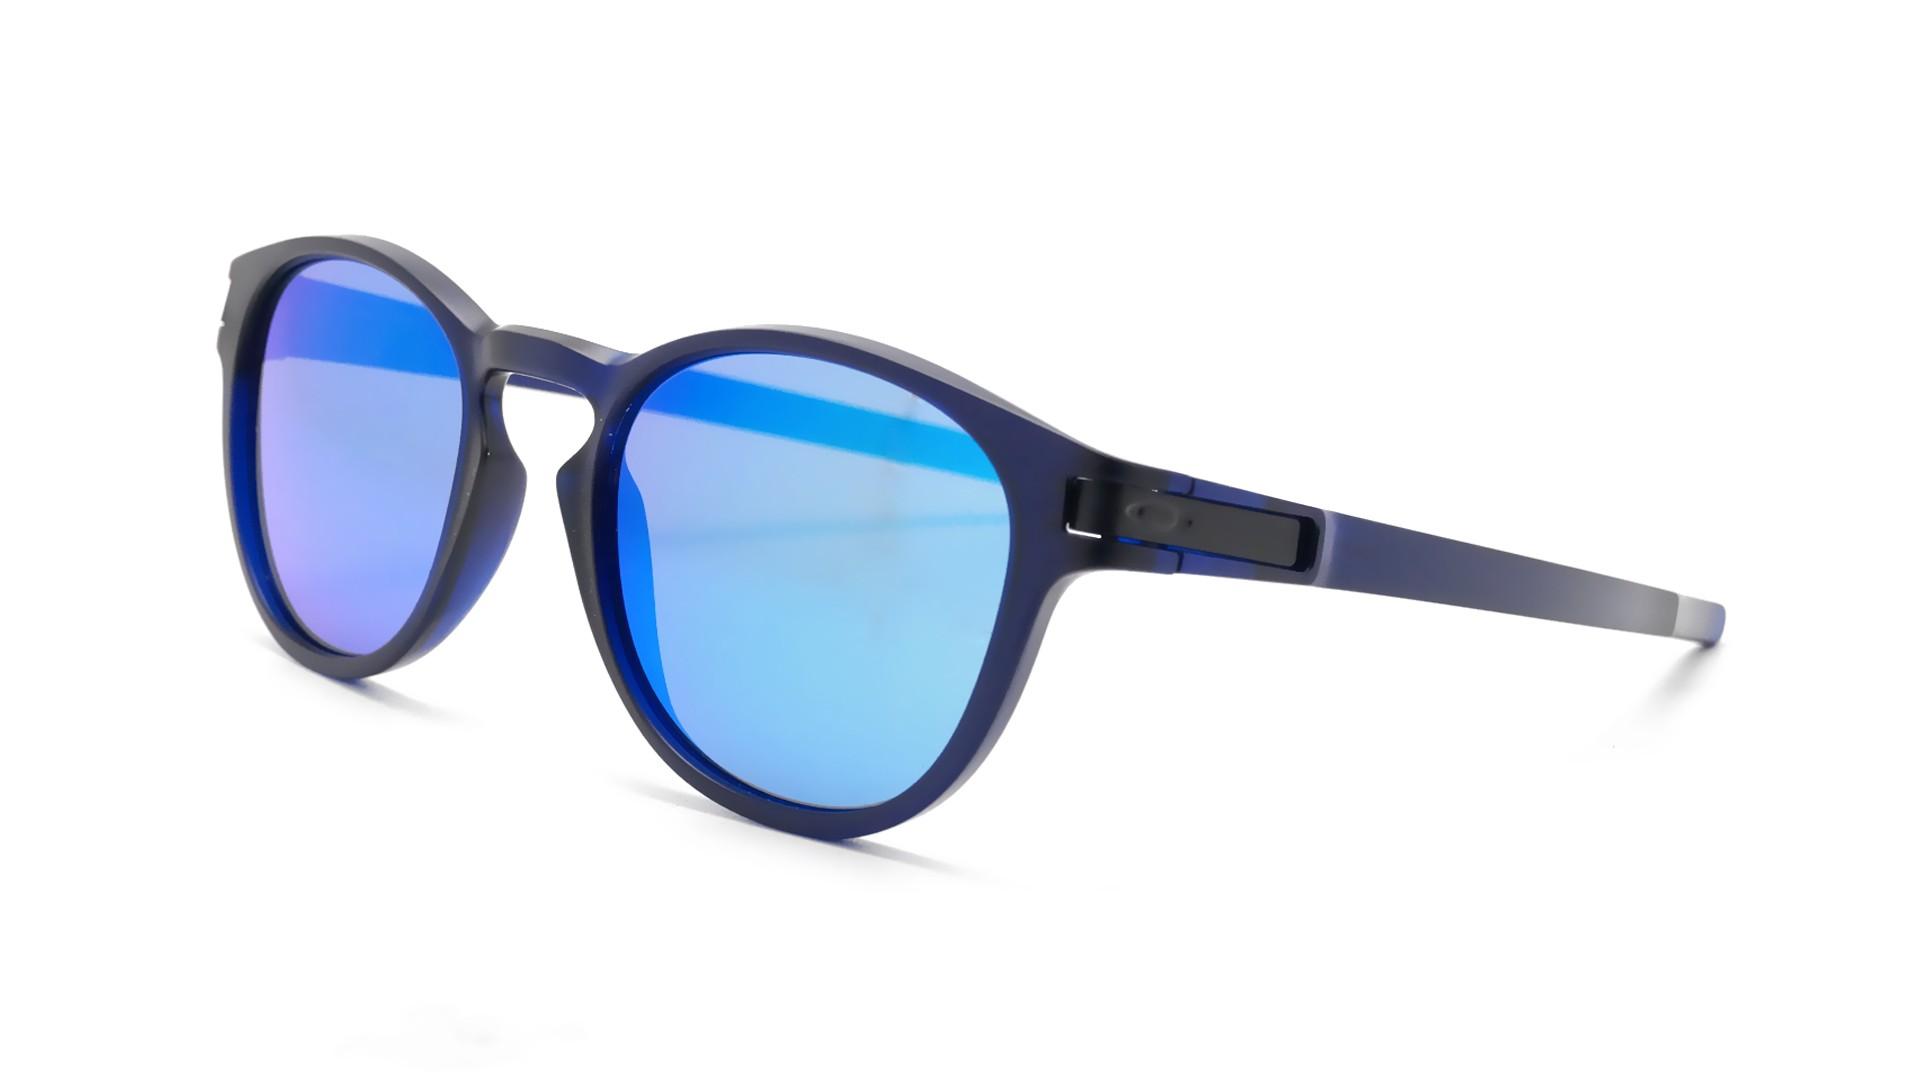 5a97abe5f95b53 lunette de soleil oakley bleu